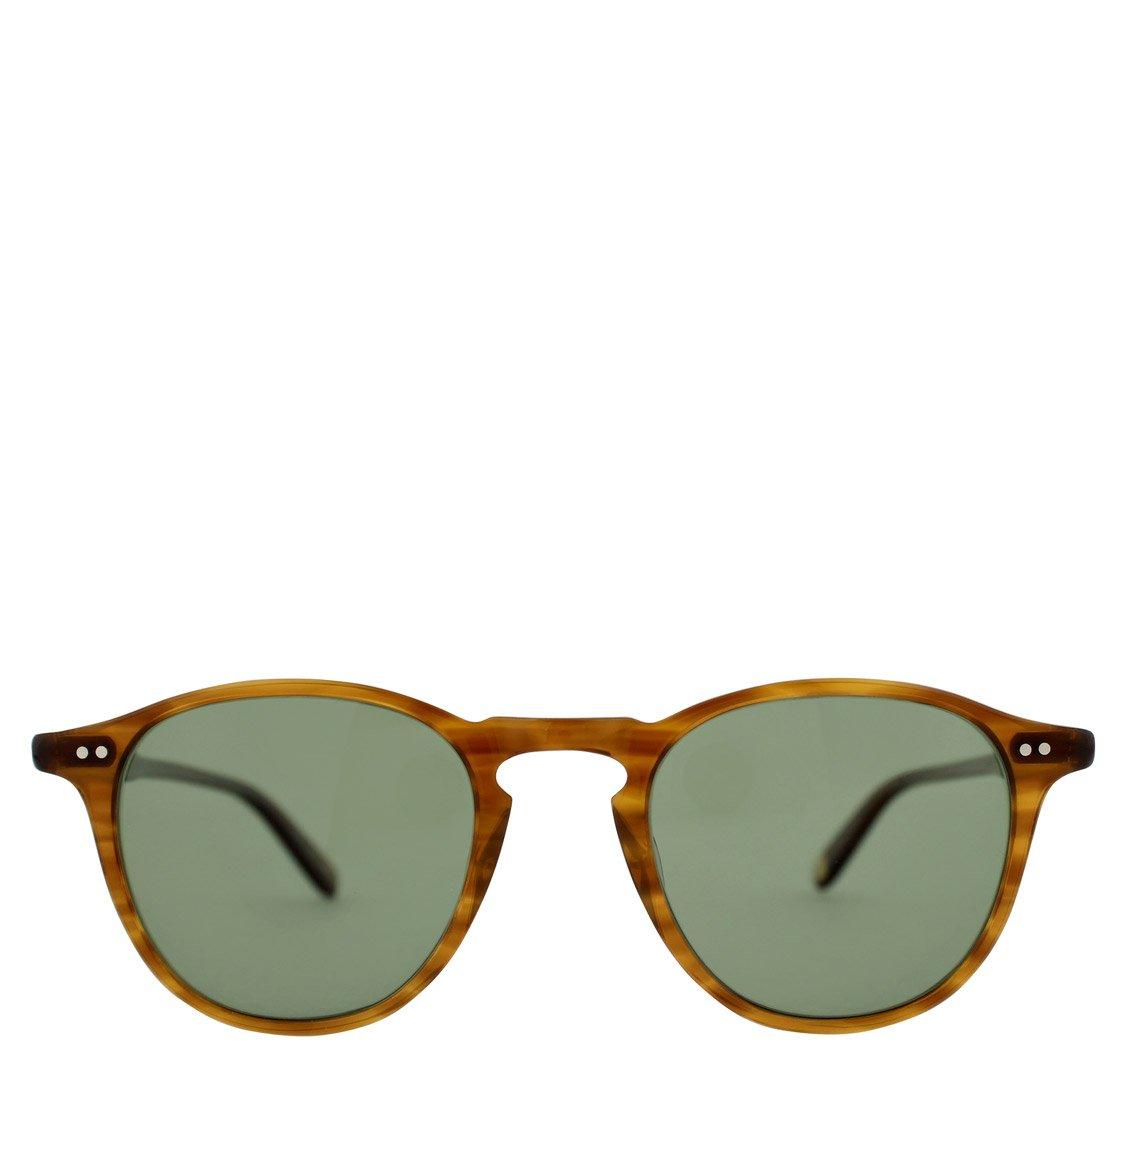 Garrett Leight Square Demi Blonde Γυαλιά Ηλίου